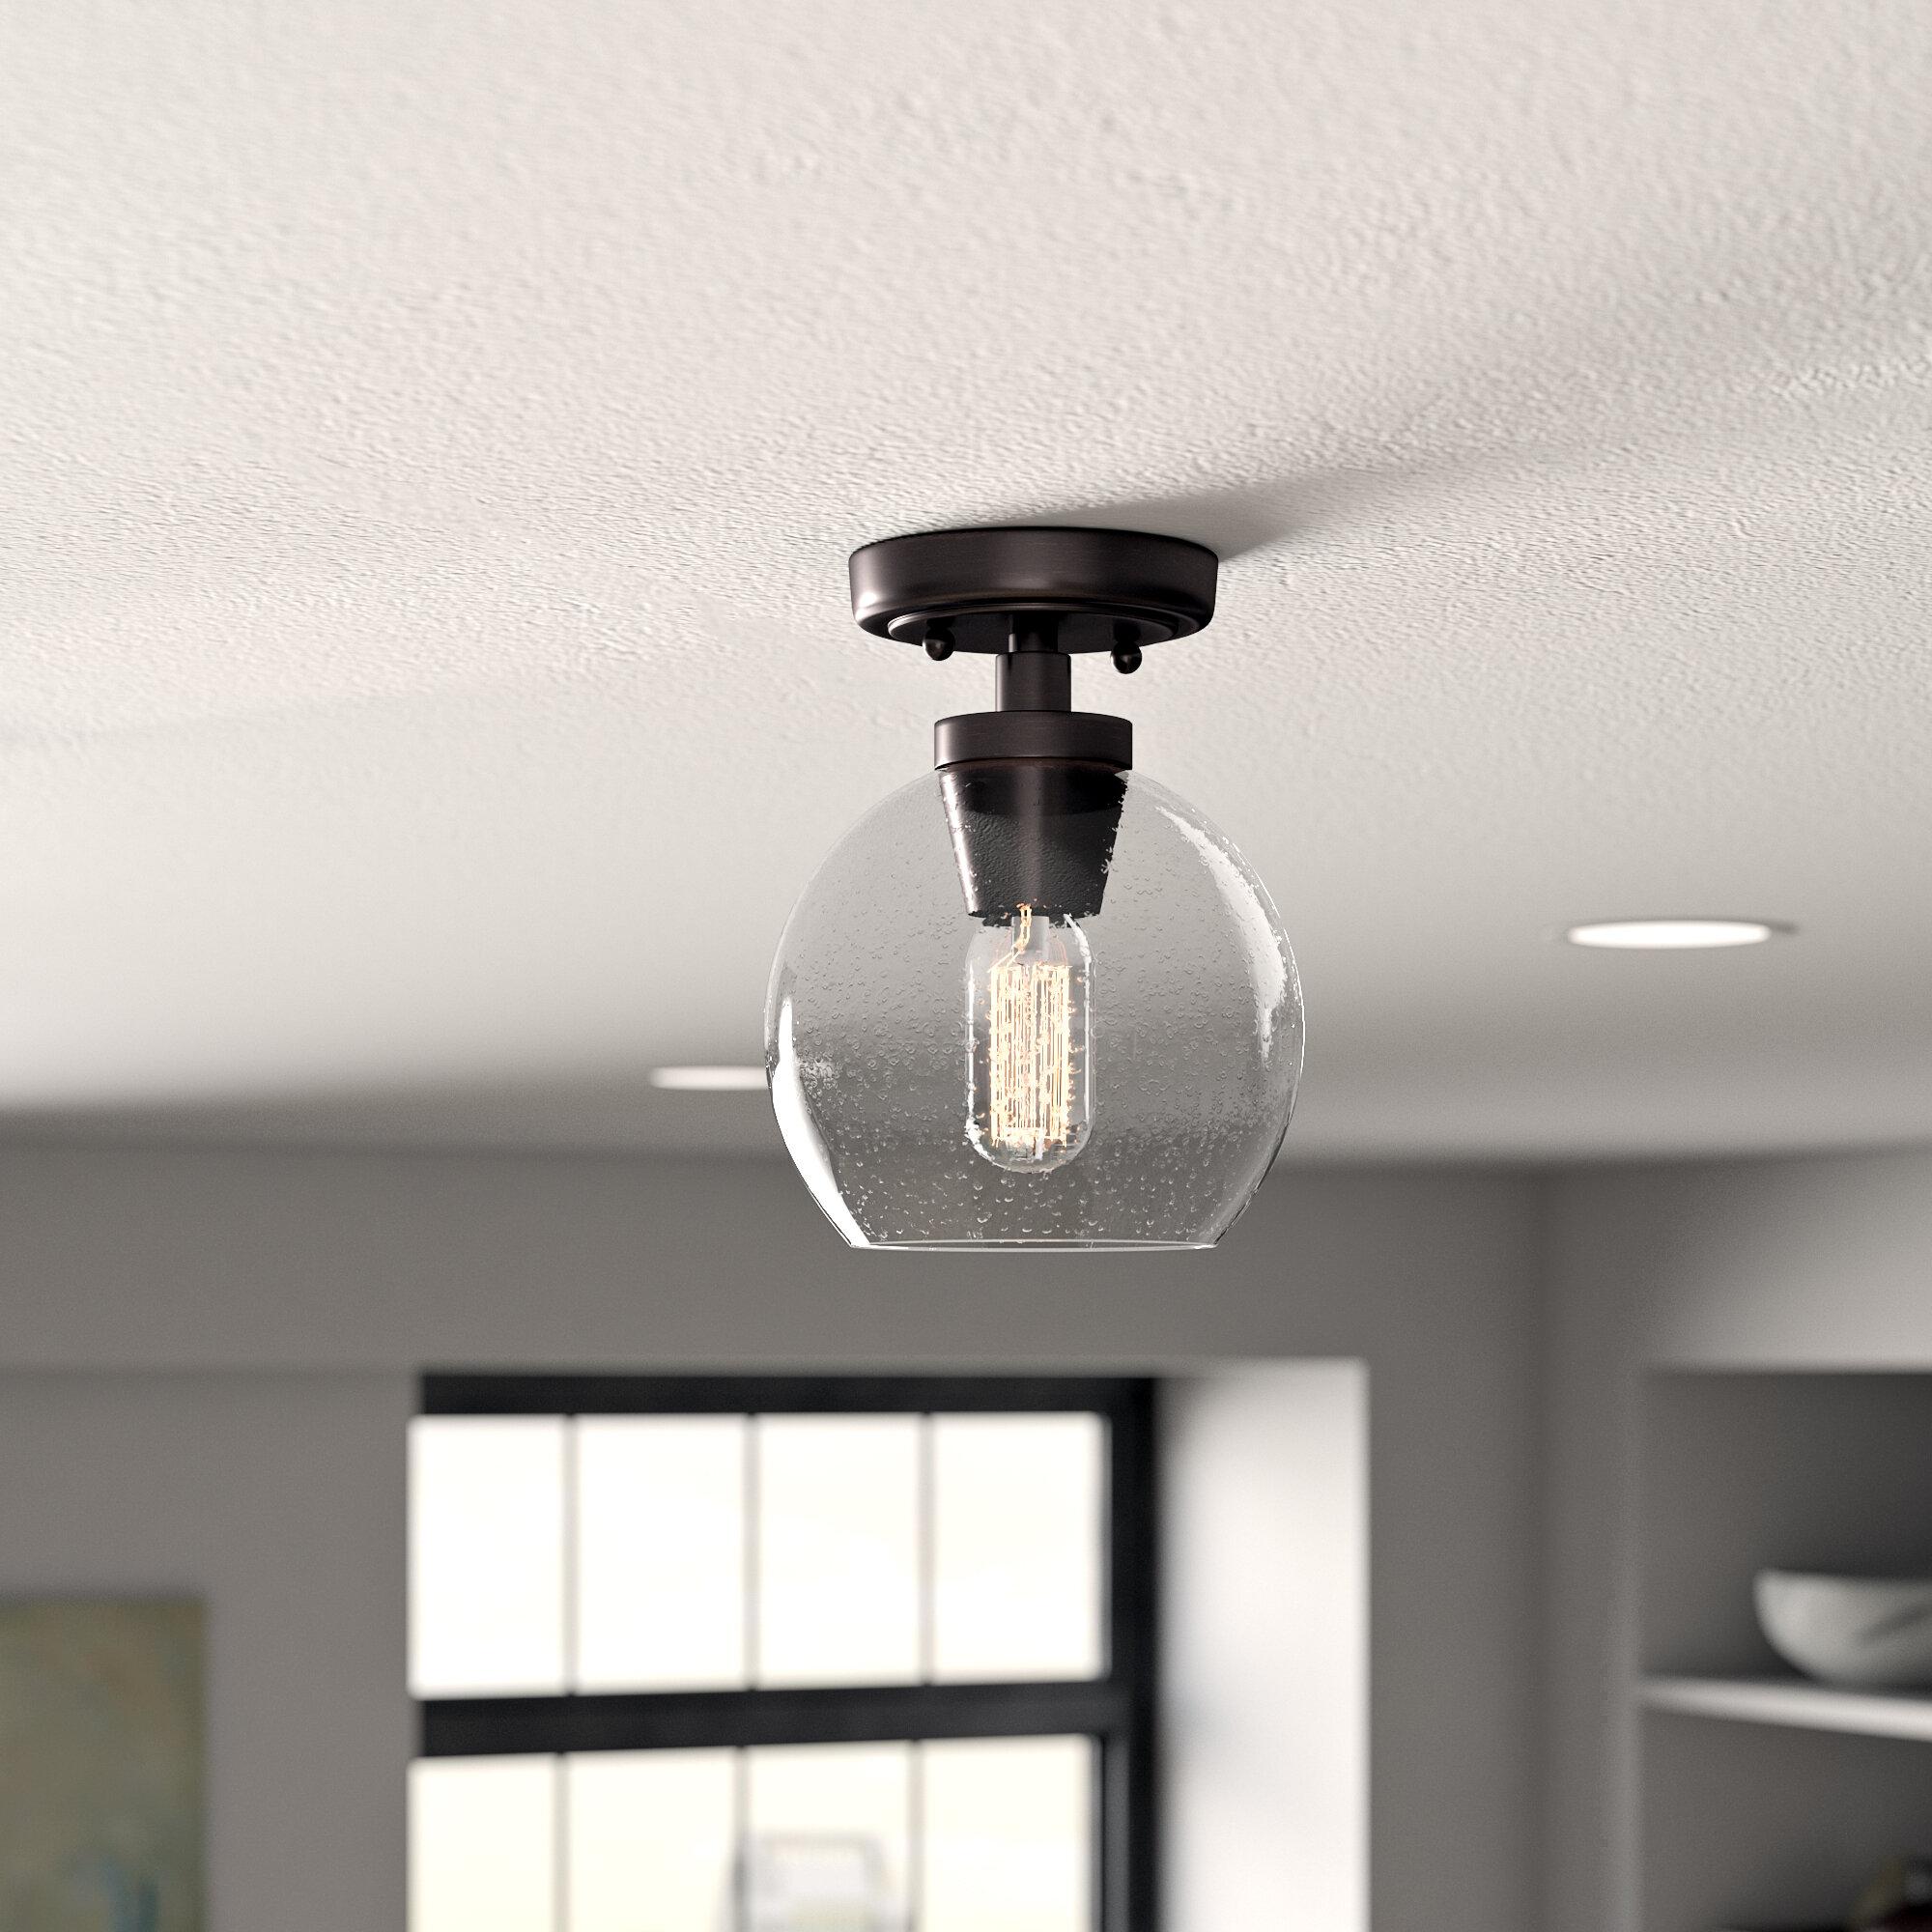 Trent austin design bronson braylen 1 light semi flush mount reviews wayfair